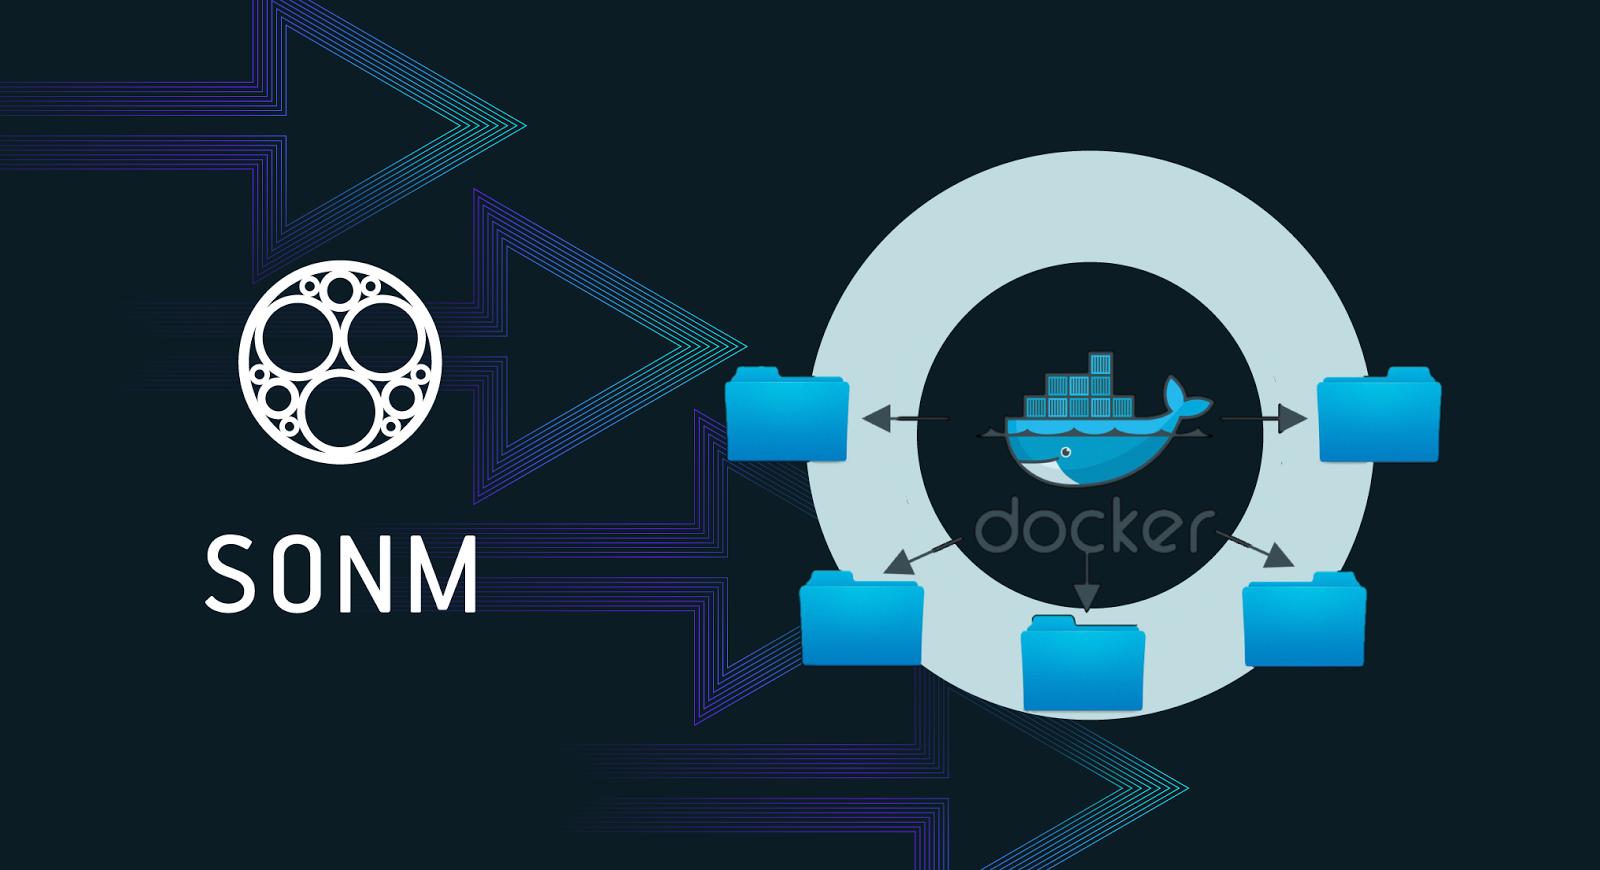 /how-to-run-custom-application-on-sonm-caa6b7879f3c feature image